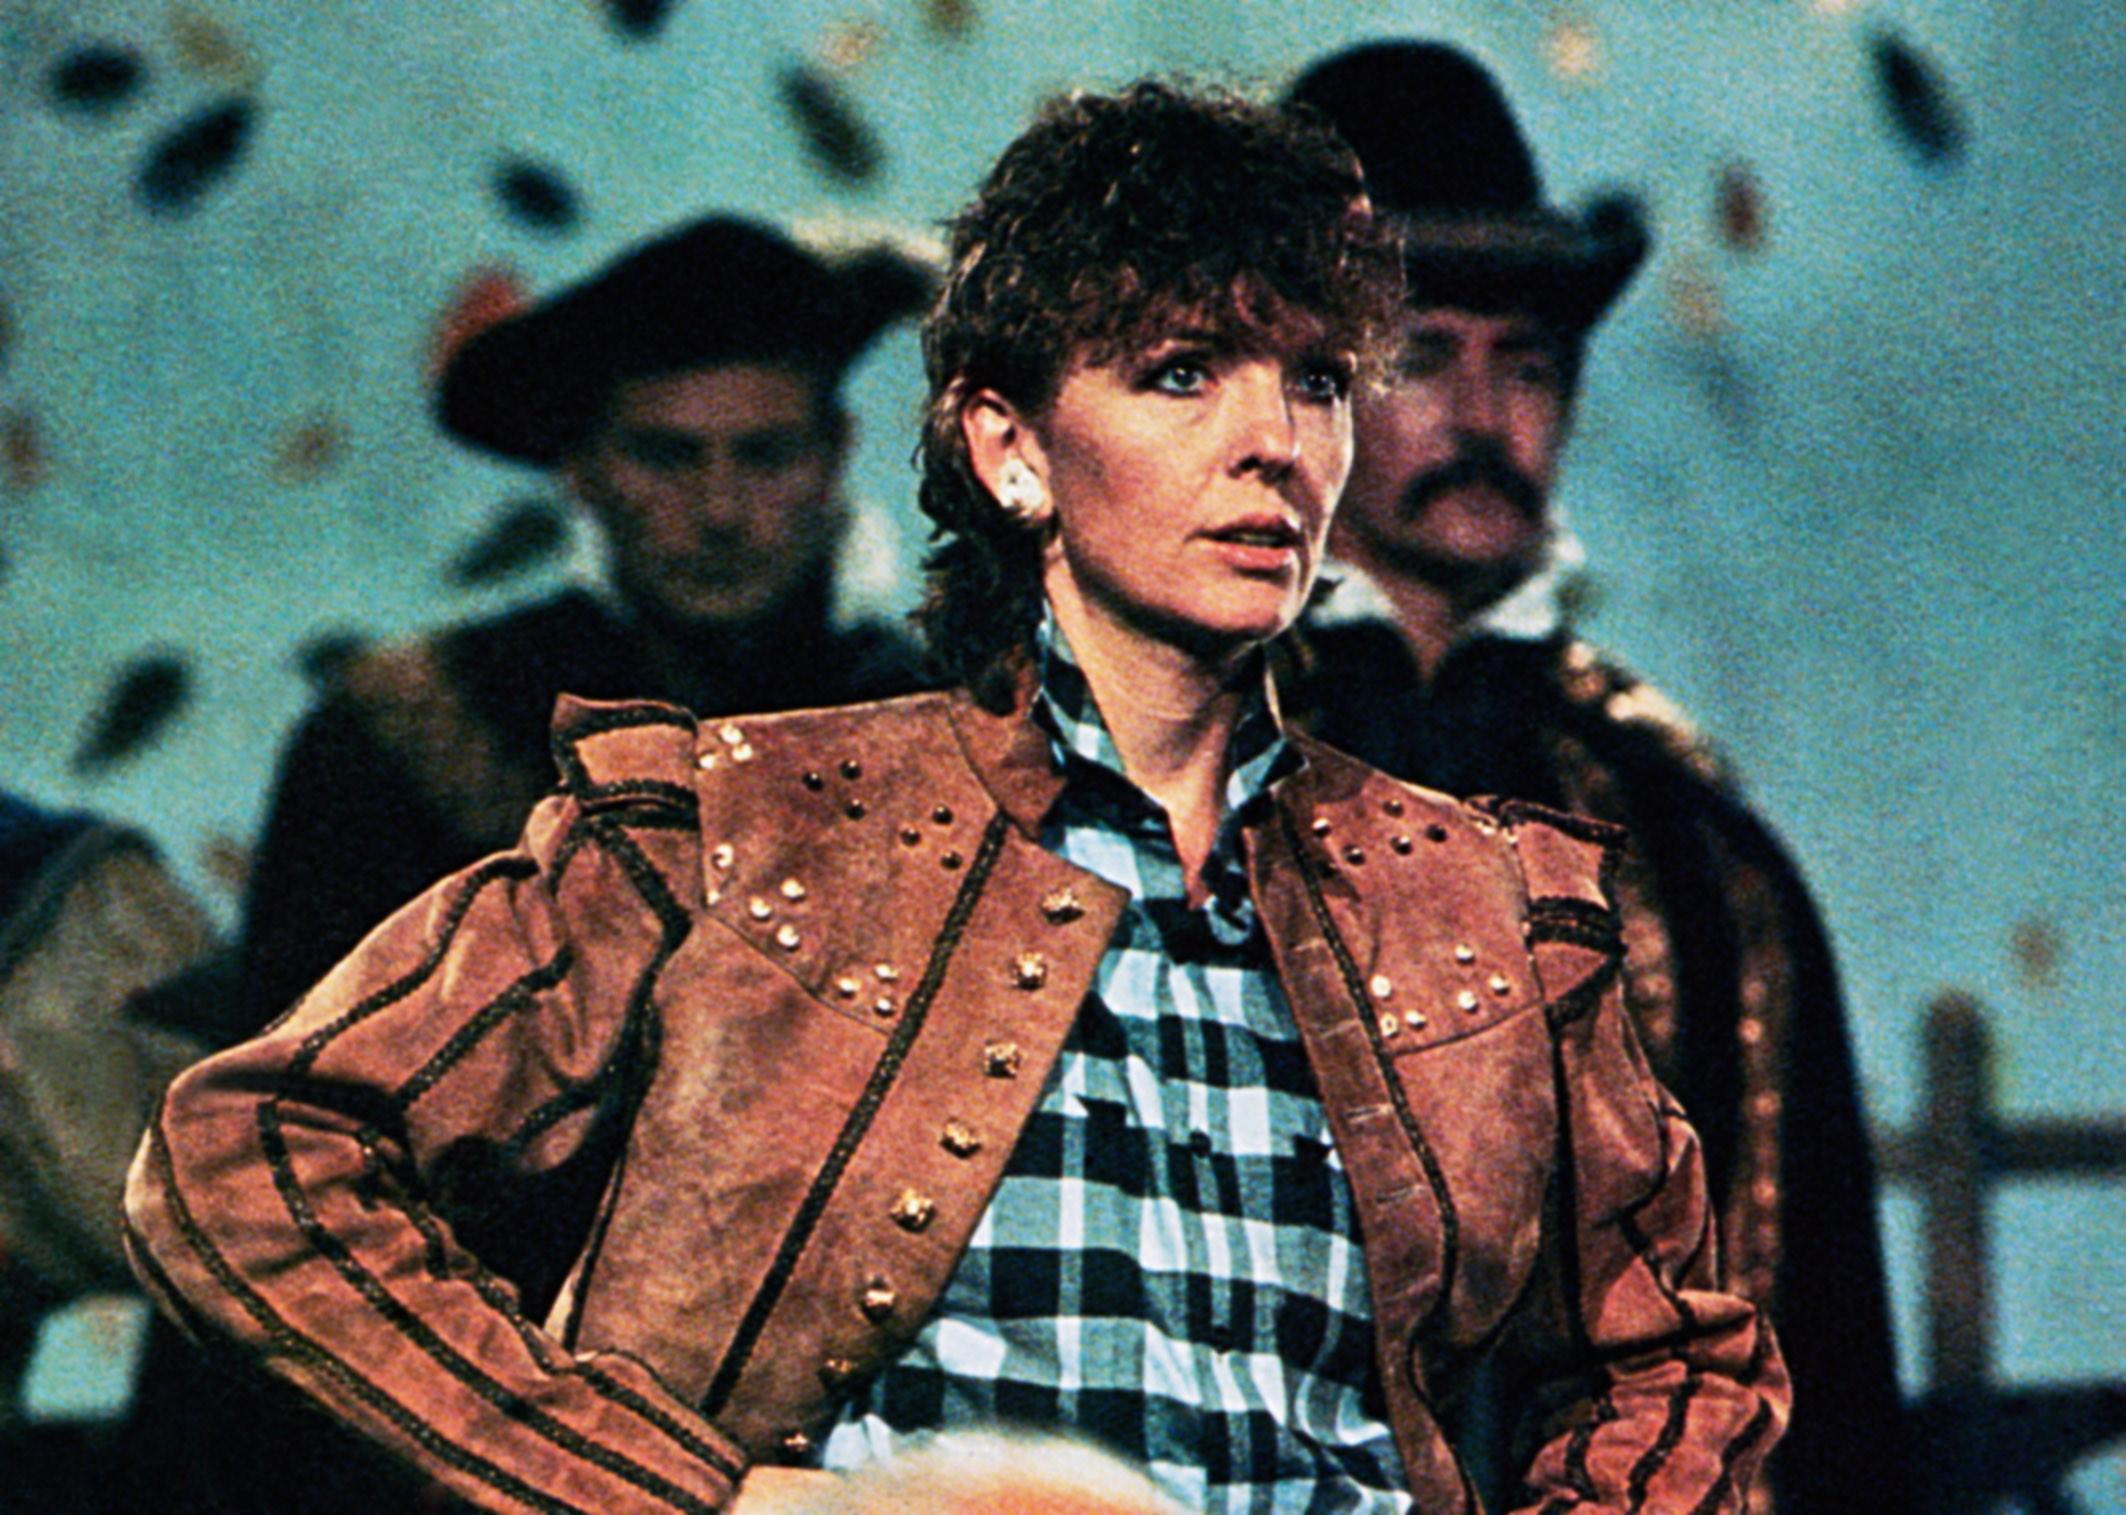 Diane Keaton as Charlie in The Little Drummer Girl, 1984